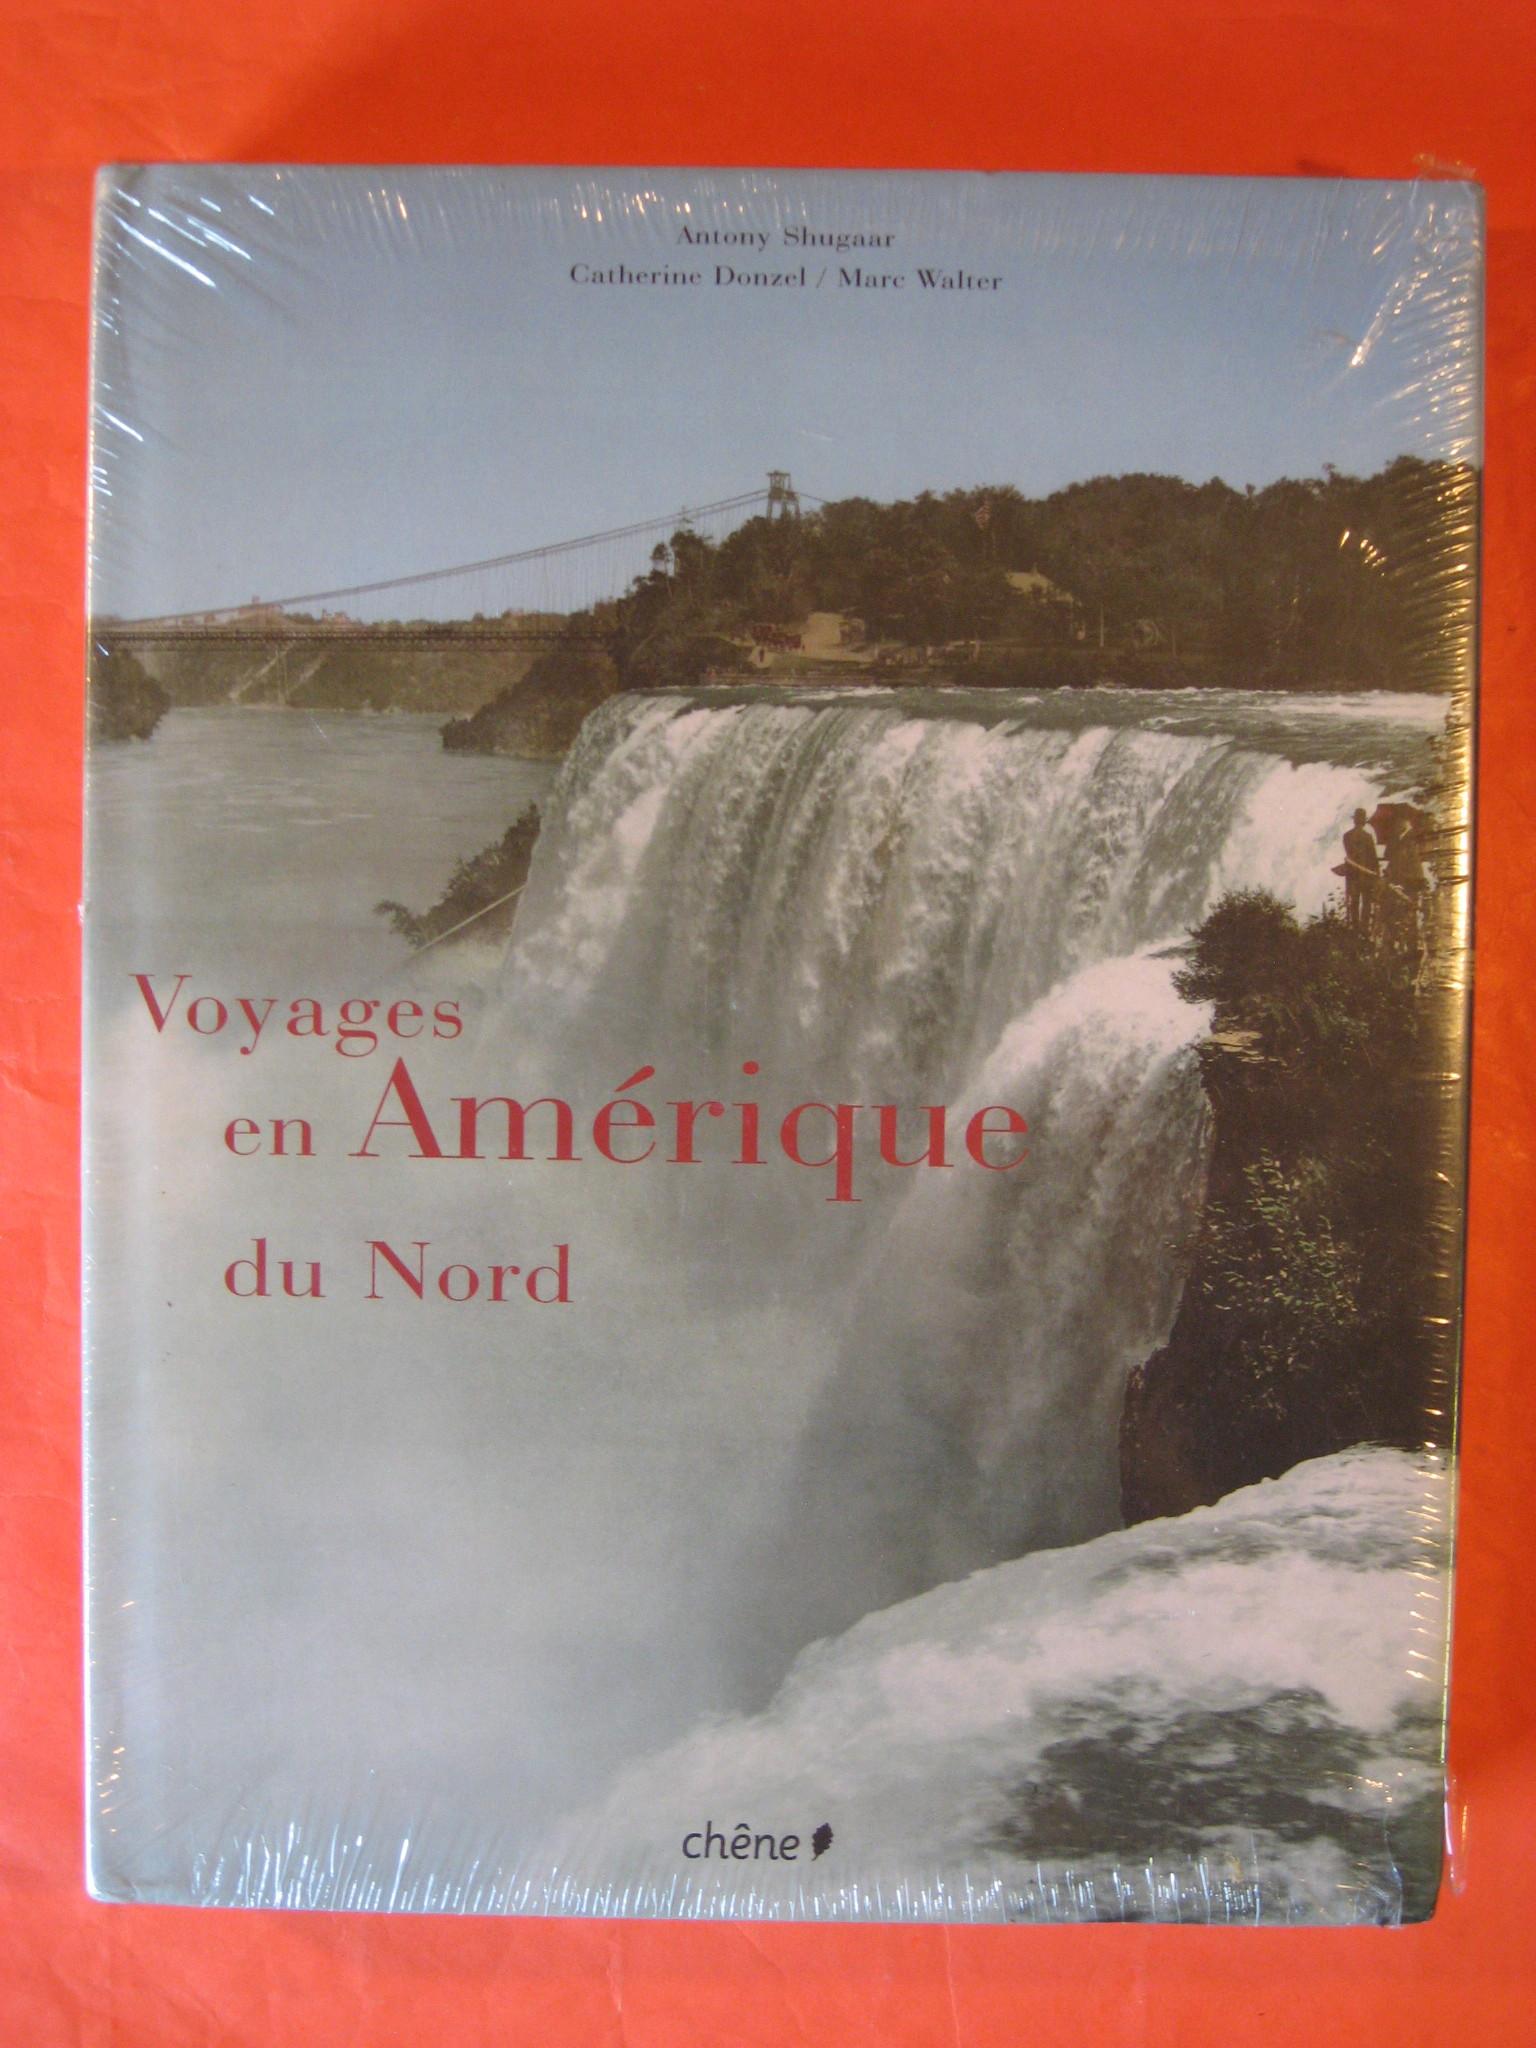 Voyages en Amérique du Nord, Shugaar, Antony; Donzel Catherine ; Walter Marc